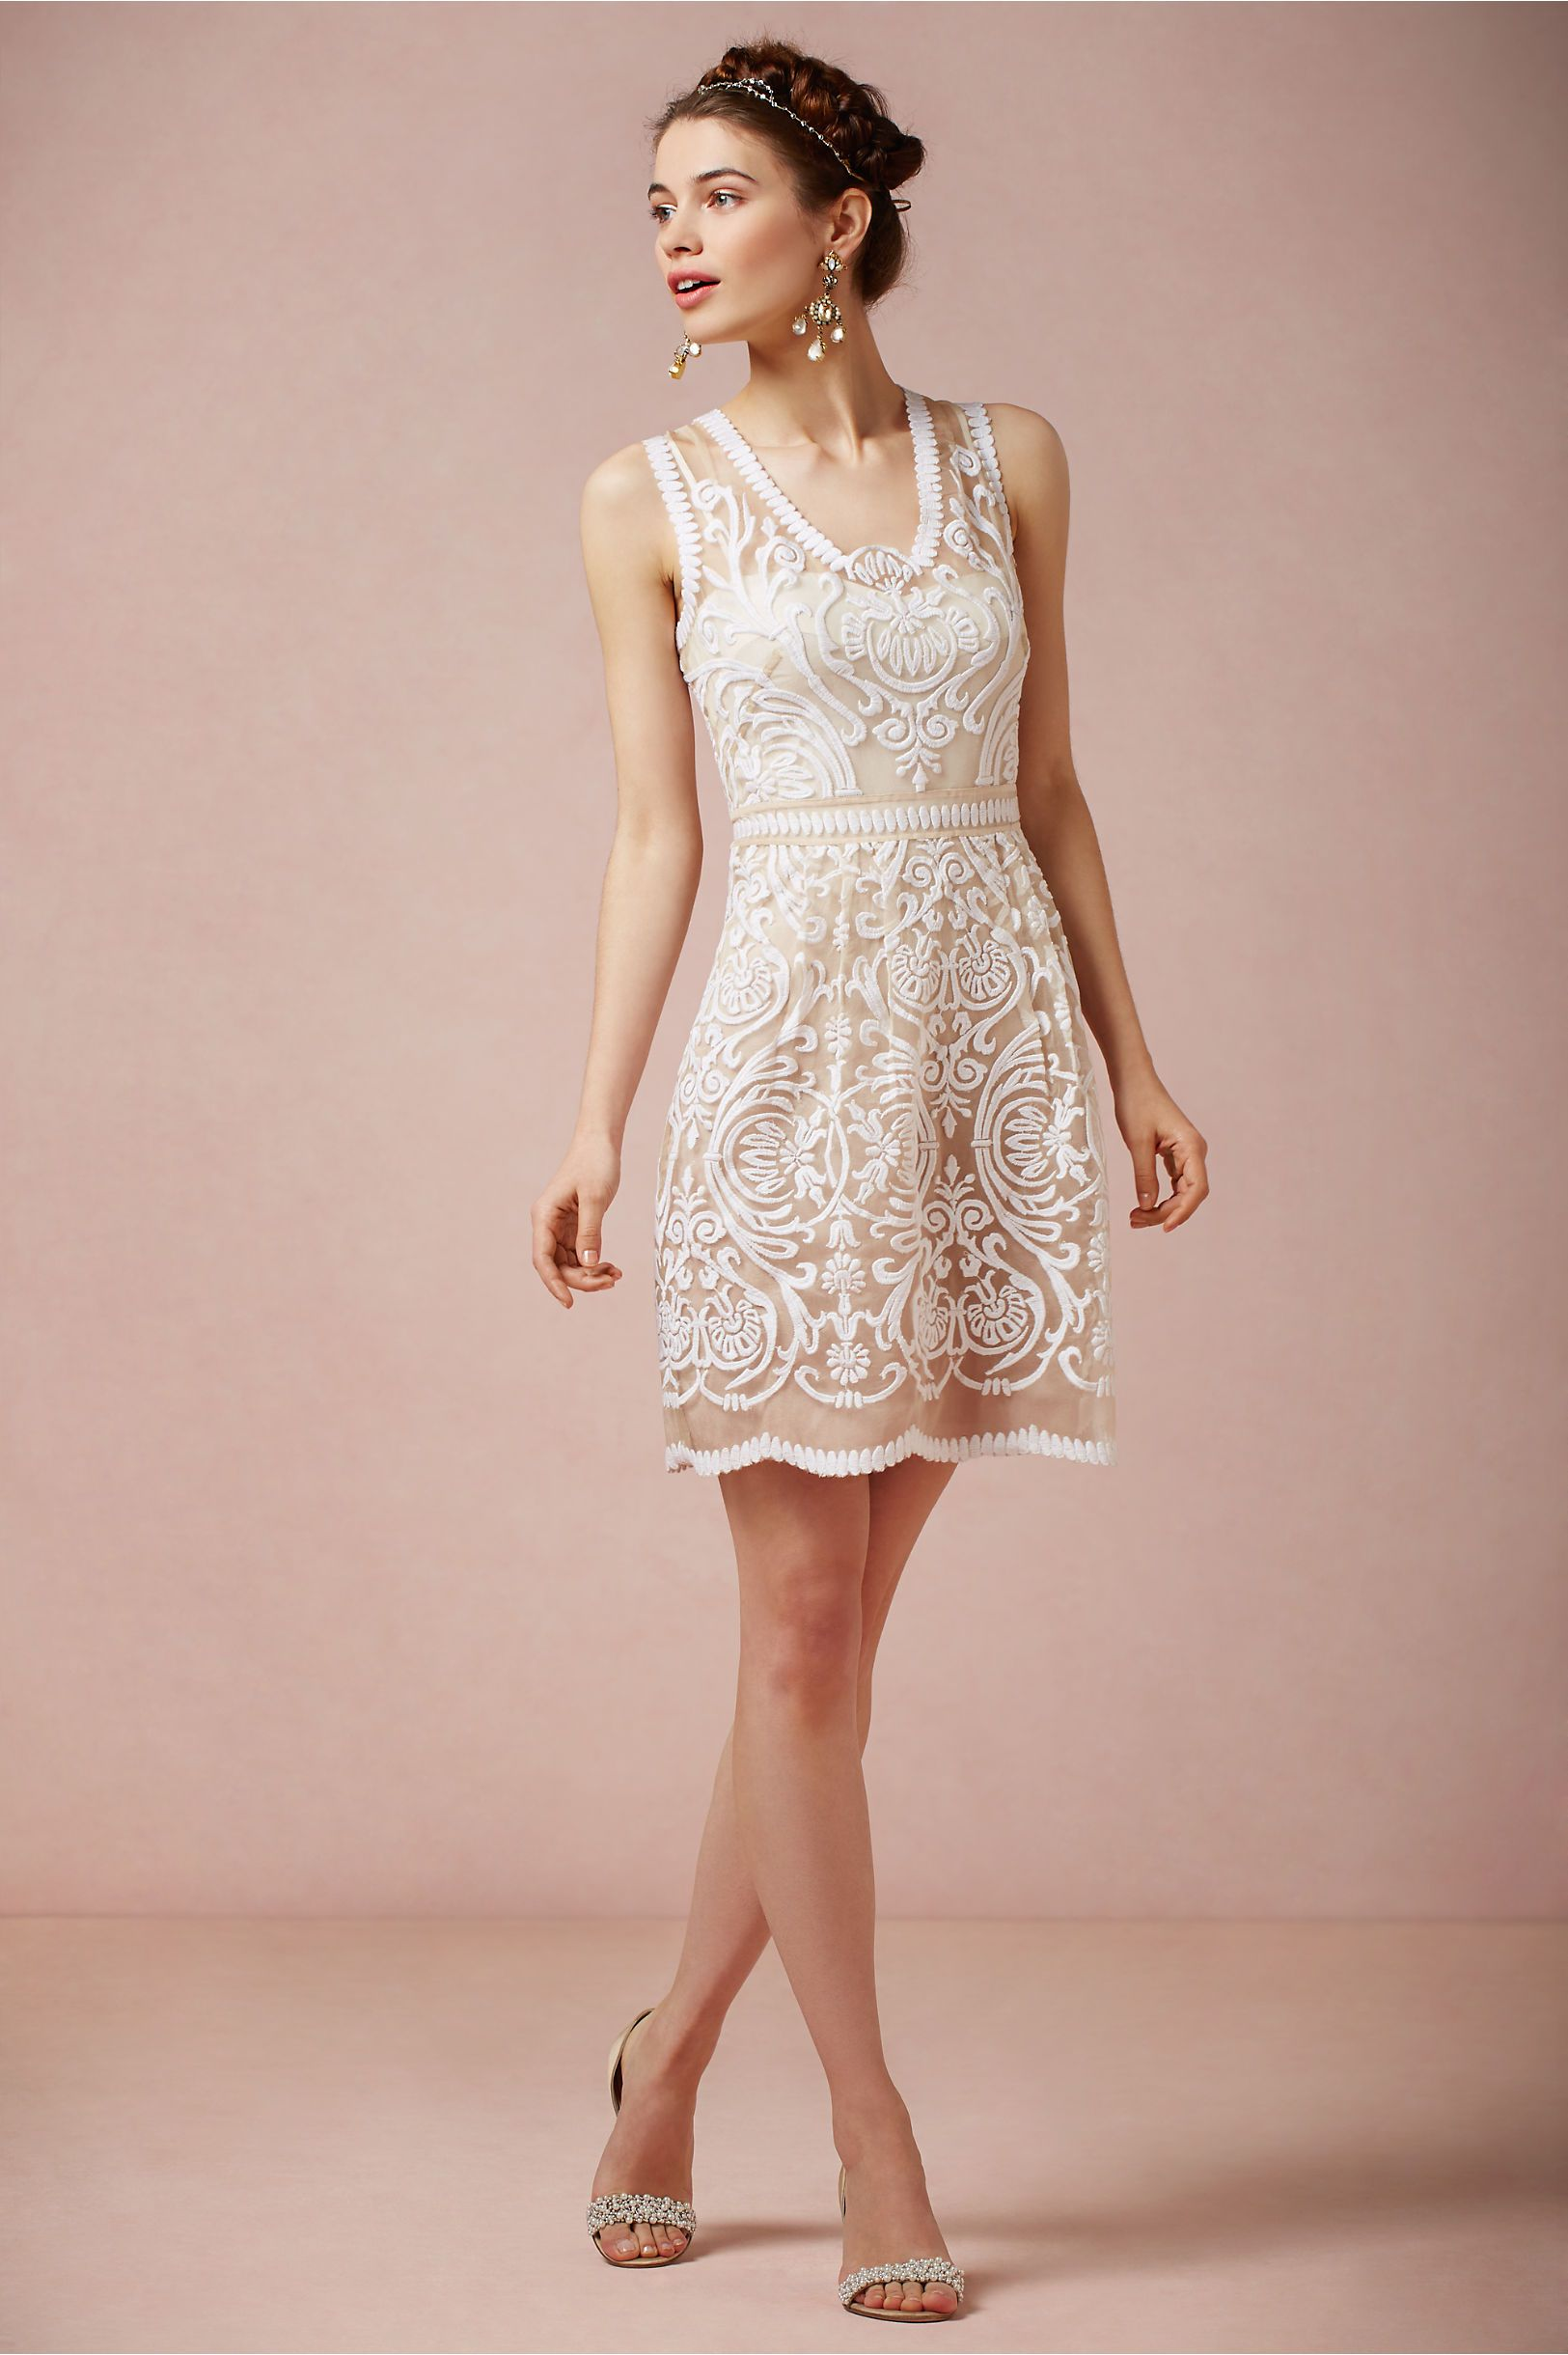 Jola Dress in Bride Reception Dresses at BHLDN | Dress | Pinterest ...